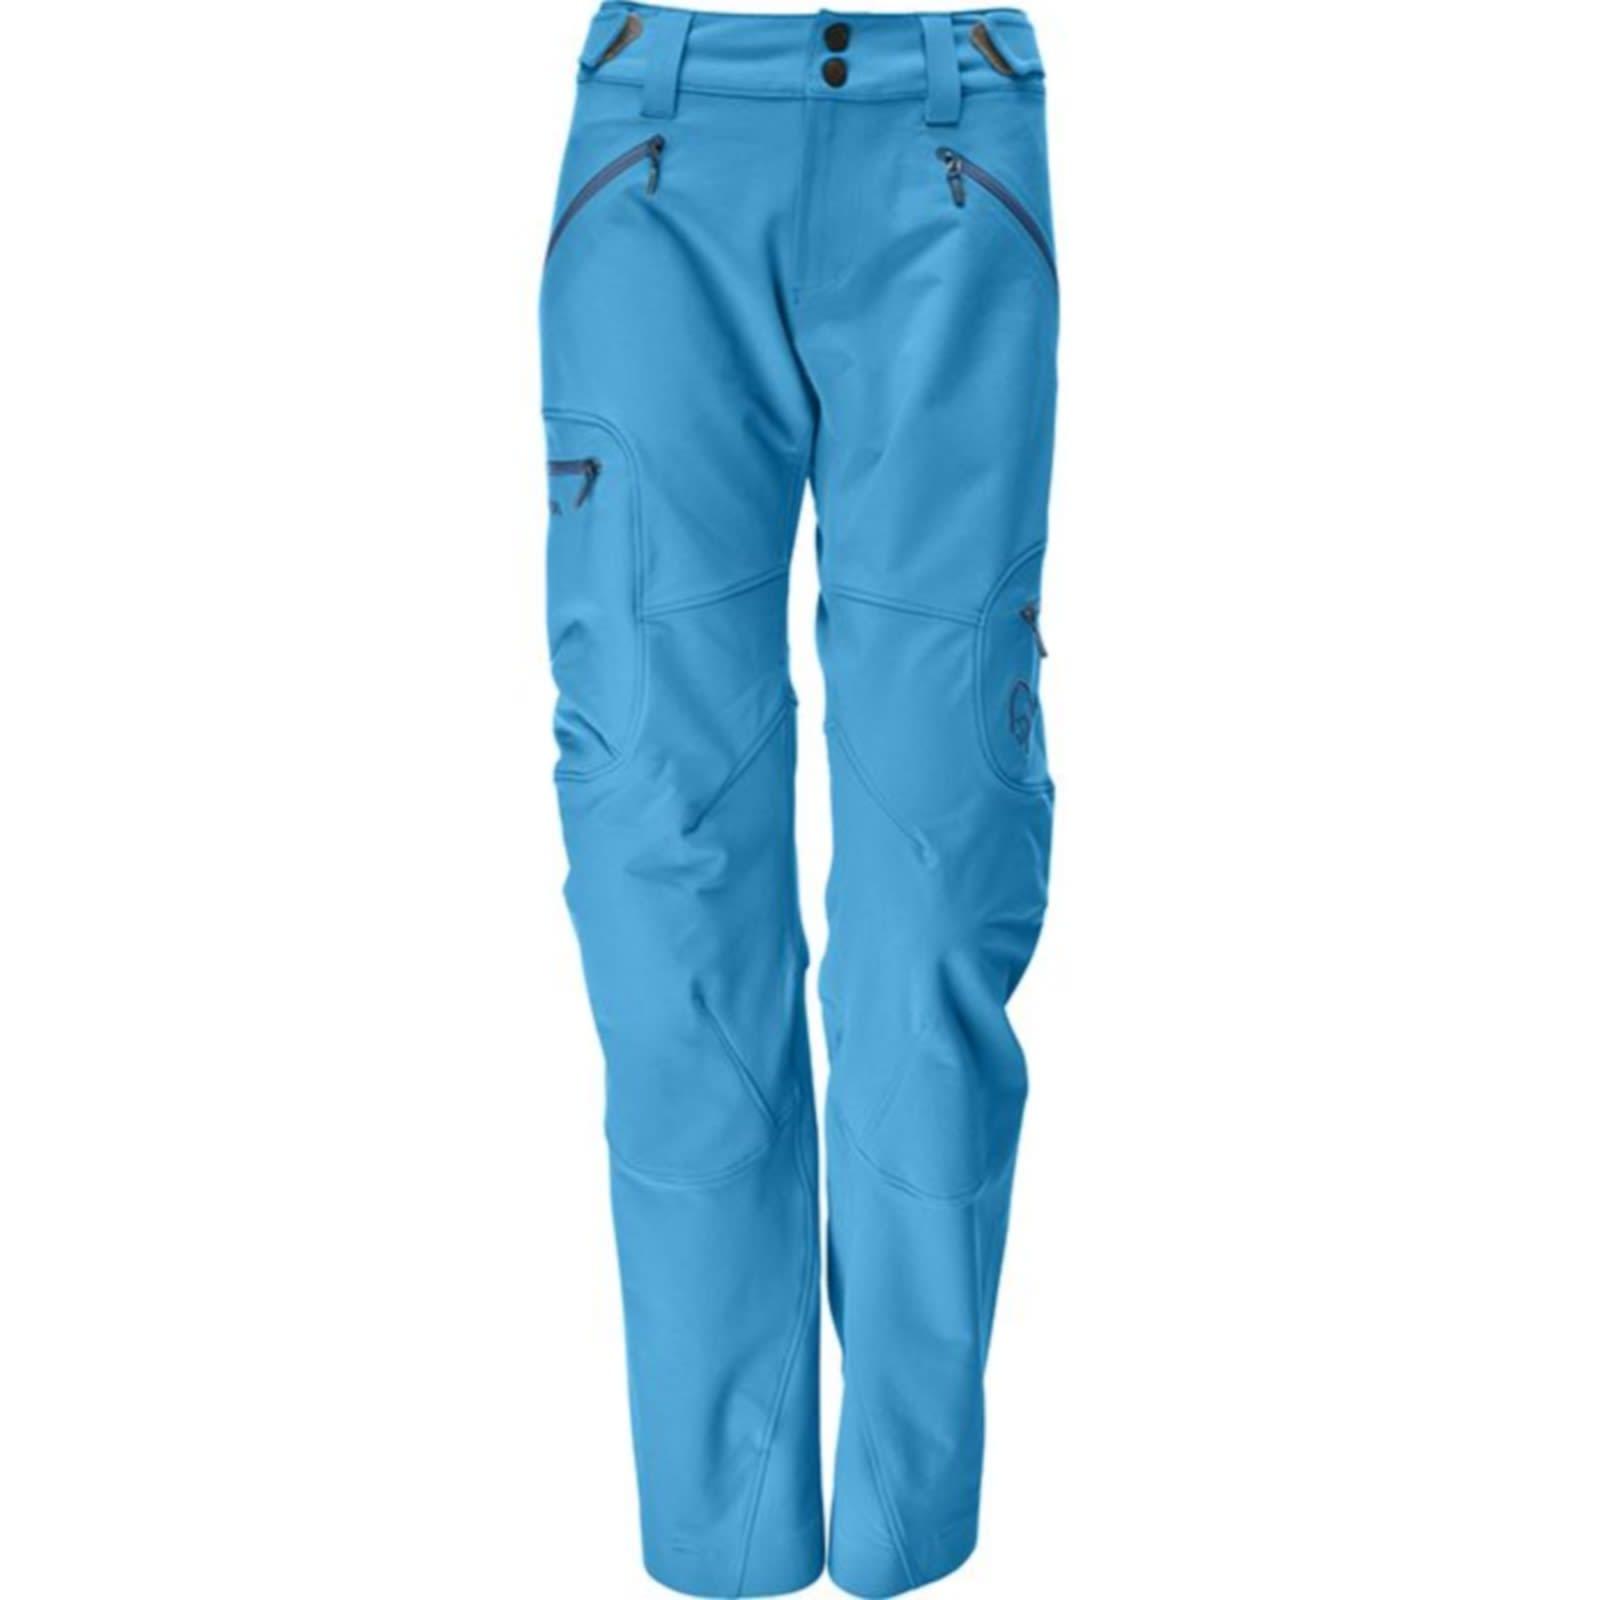 Svalbard Flex1 Pants Women's